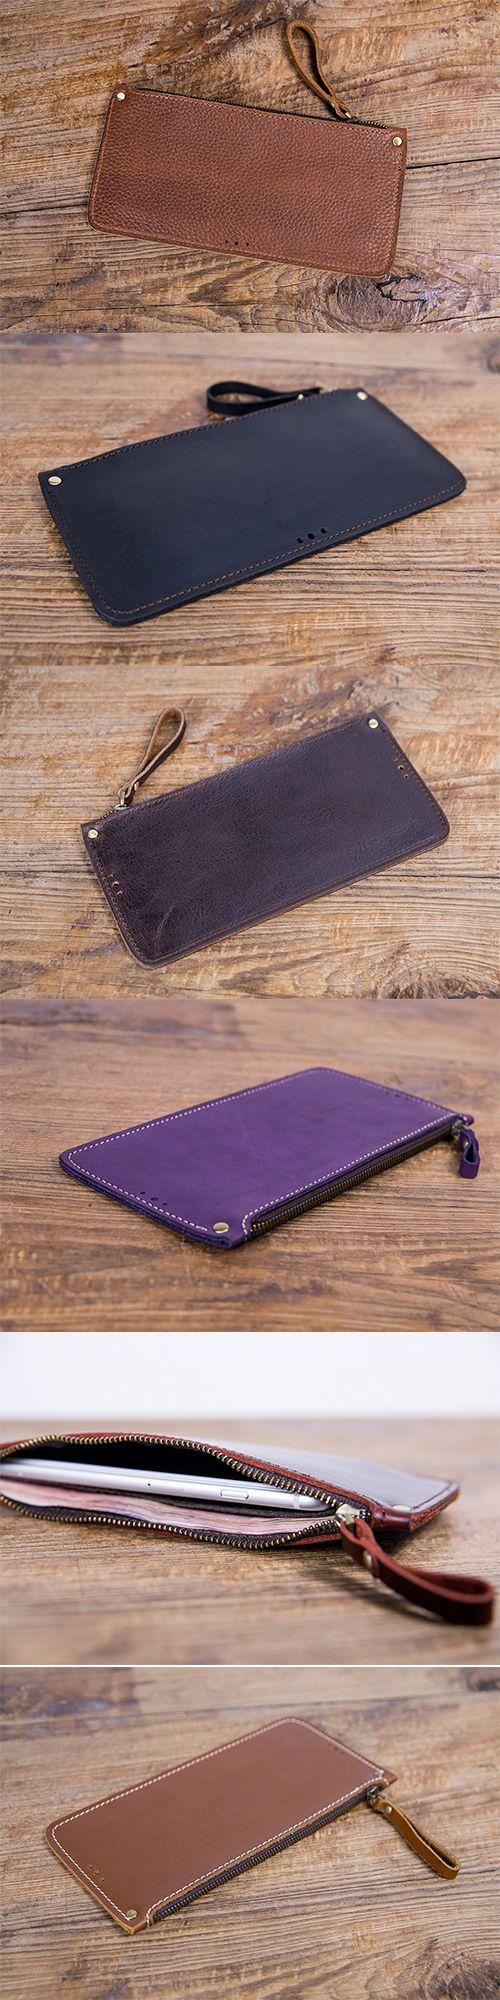 Handmade leather vintage women long wallet clutch zip phone purse wallet